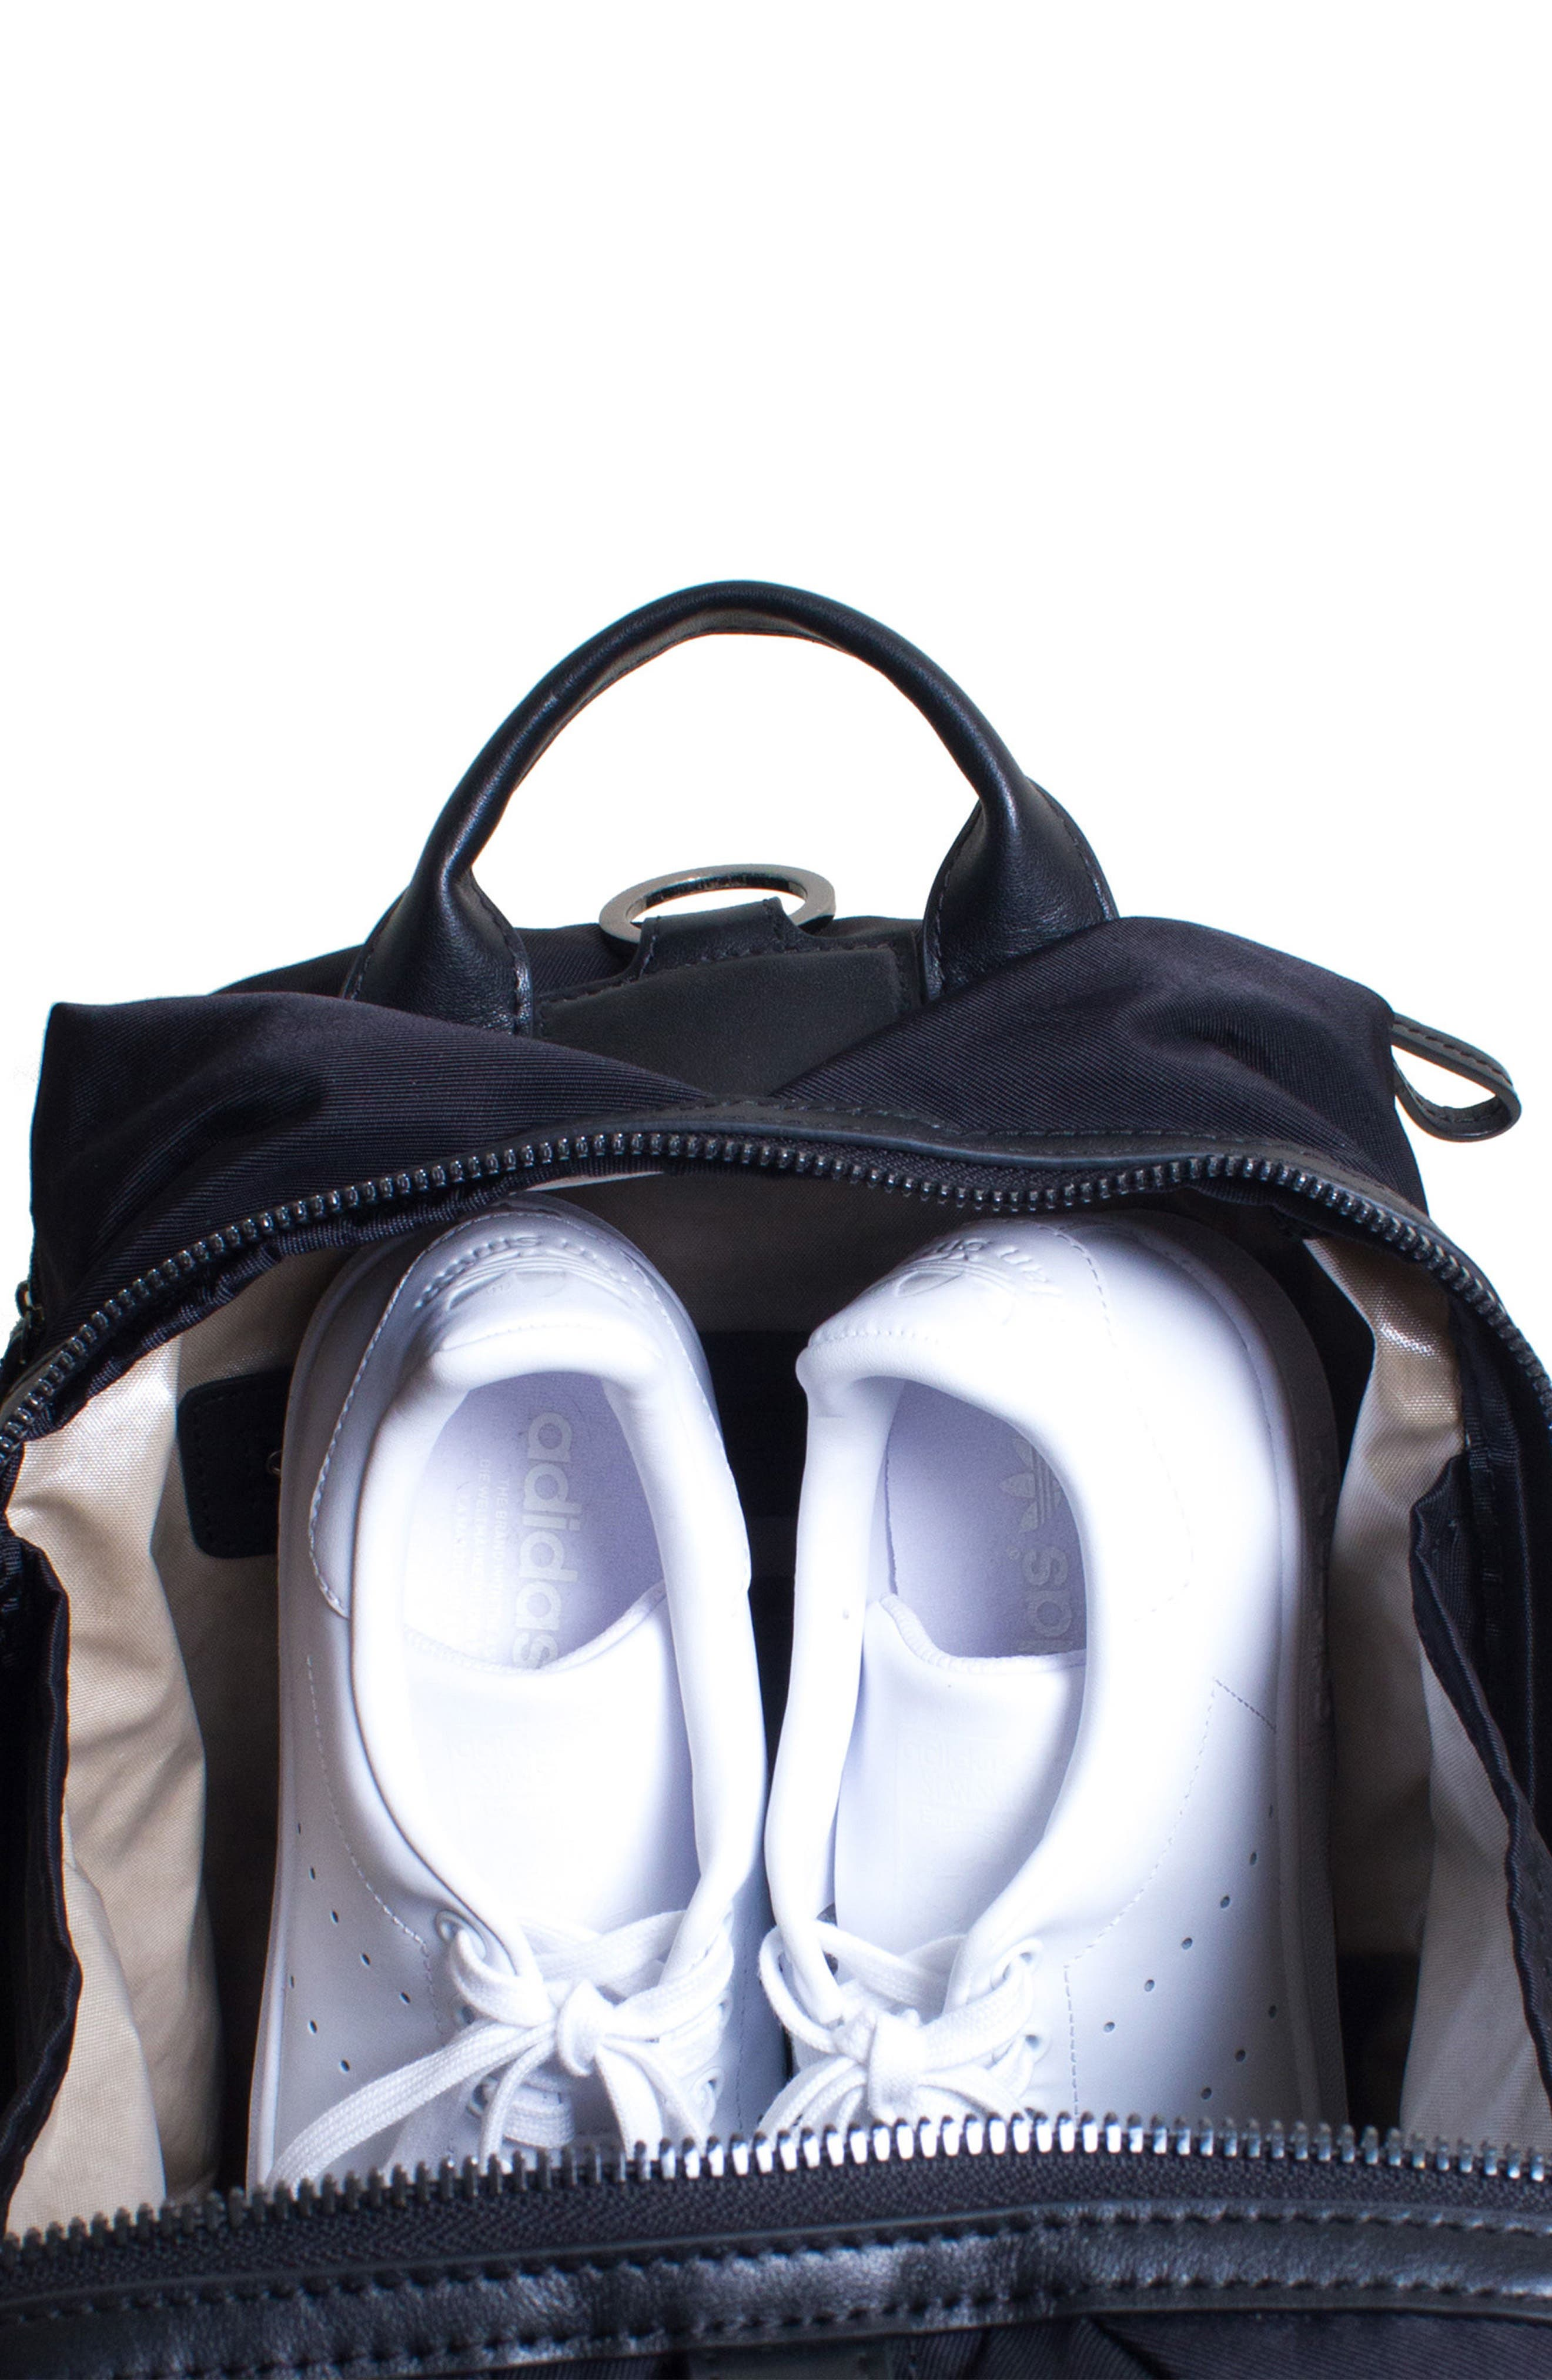 Studio Medium Duffel Backpack,                             Alternate thumbnail 2, color,                             BLACK